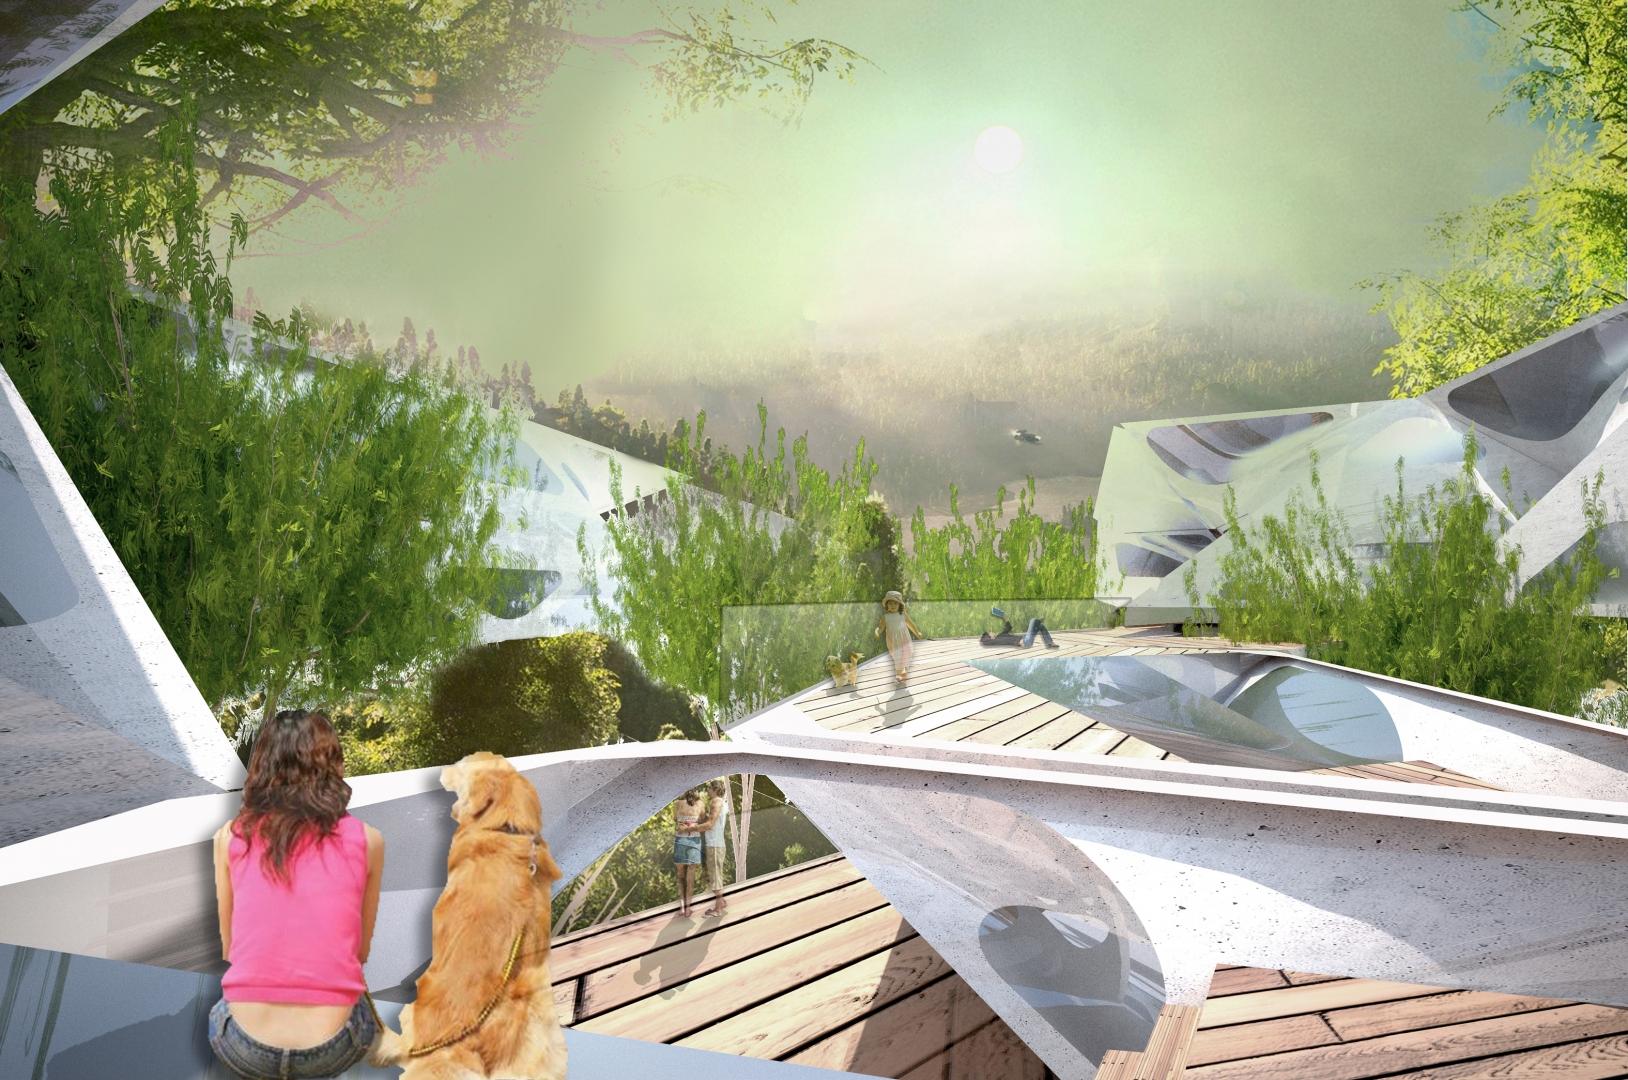 Enlarge Photo: Project L: Sustainable Design Studio 2